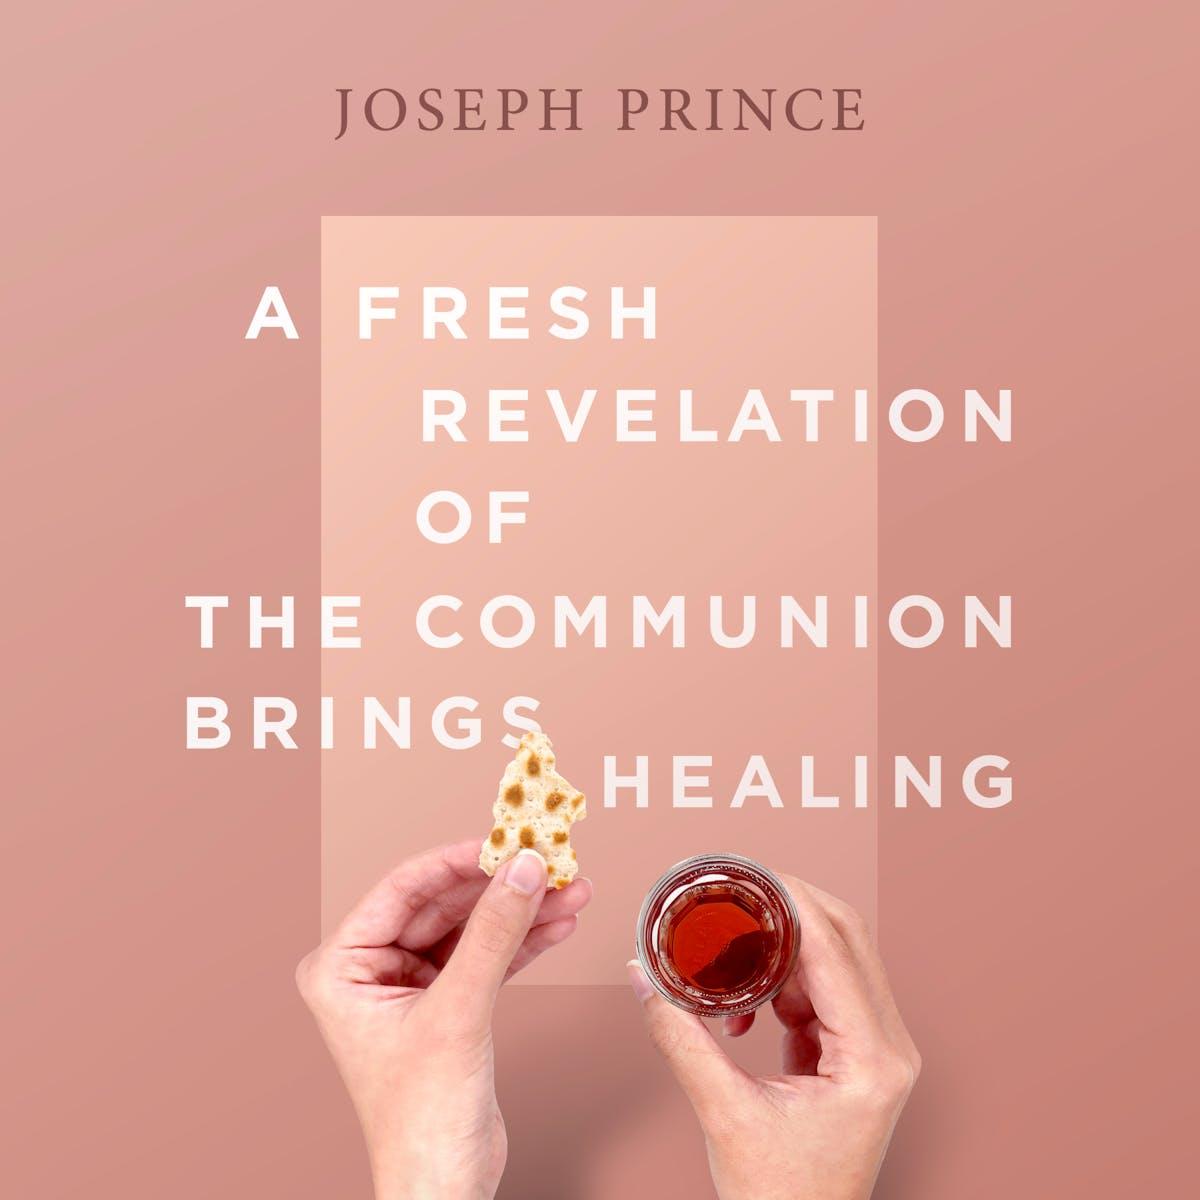 A Fresh Revelation Of The Communion Brings Healing